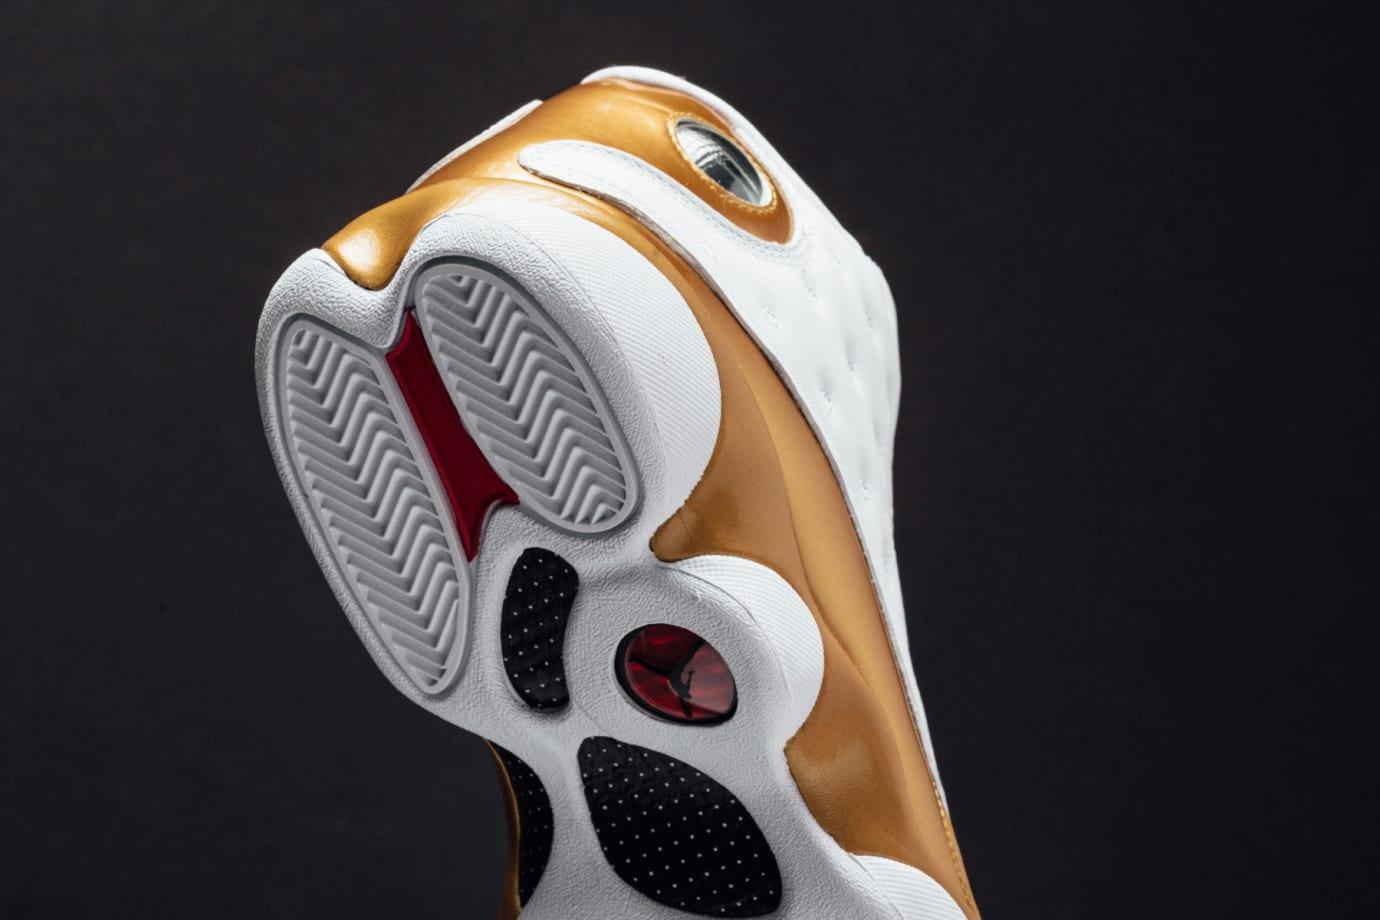 Jordan 13 DMP Heel